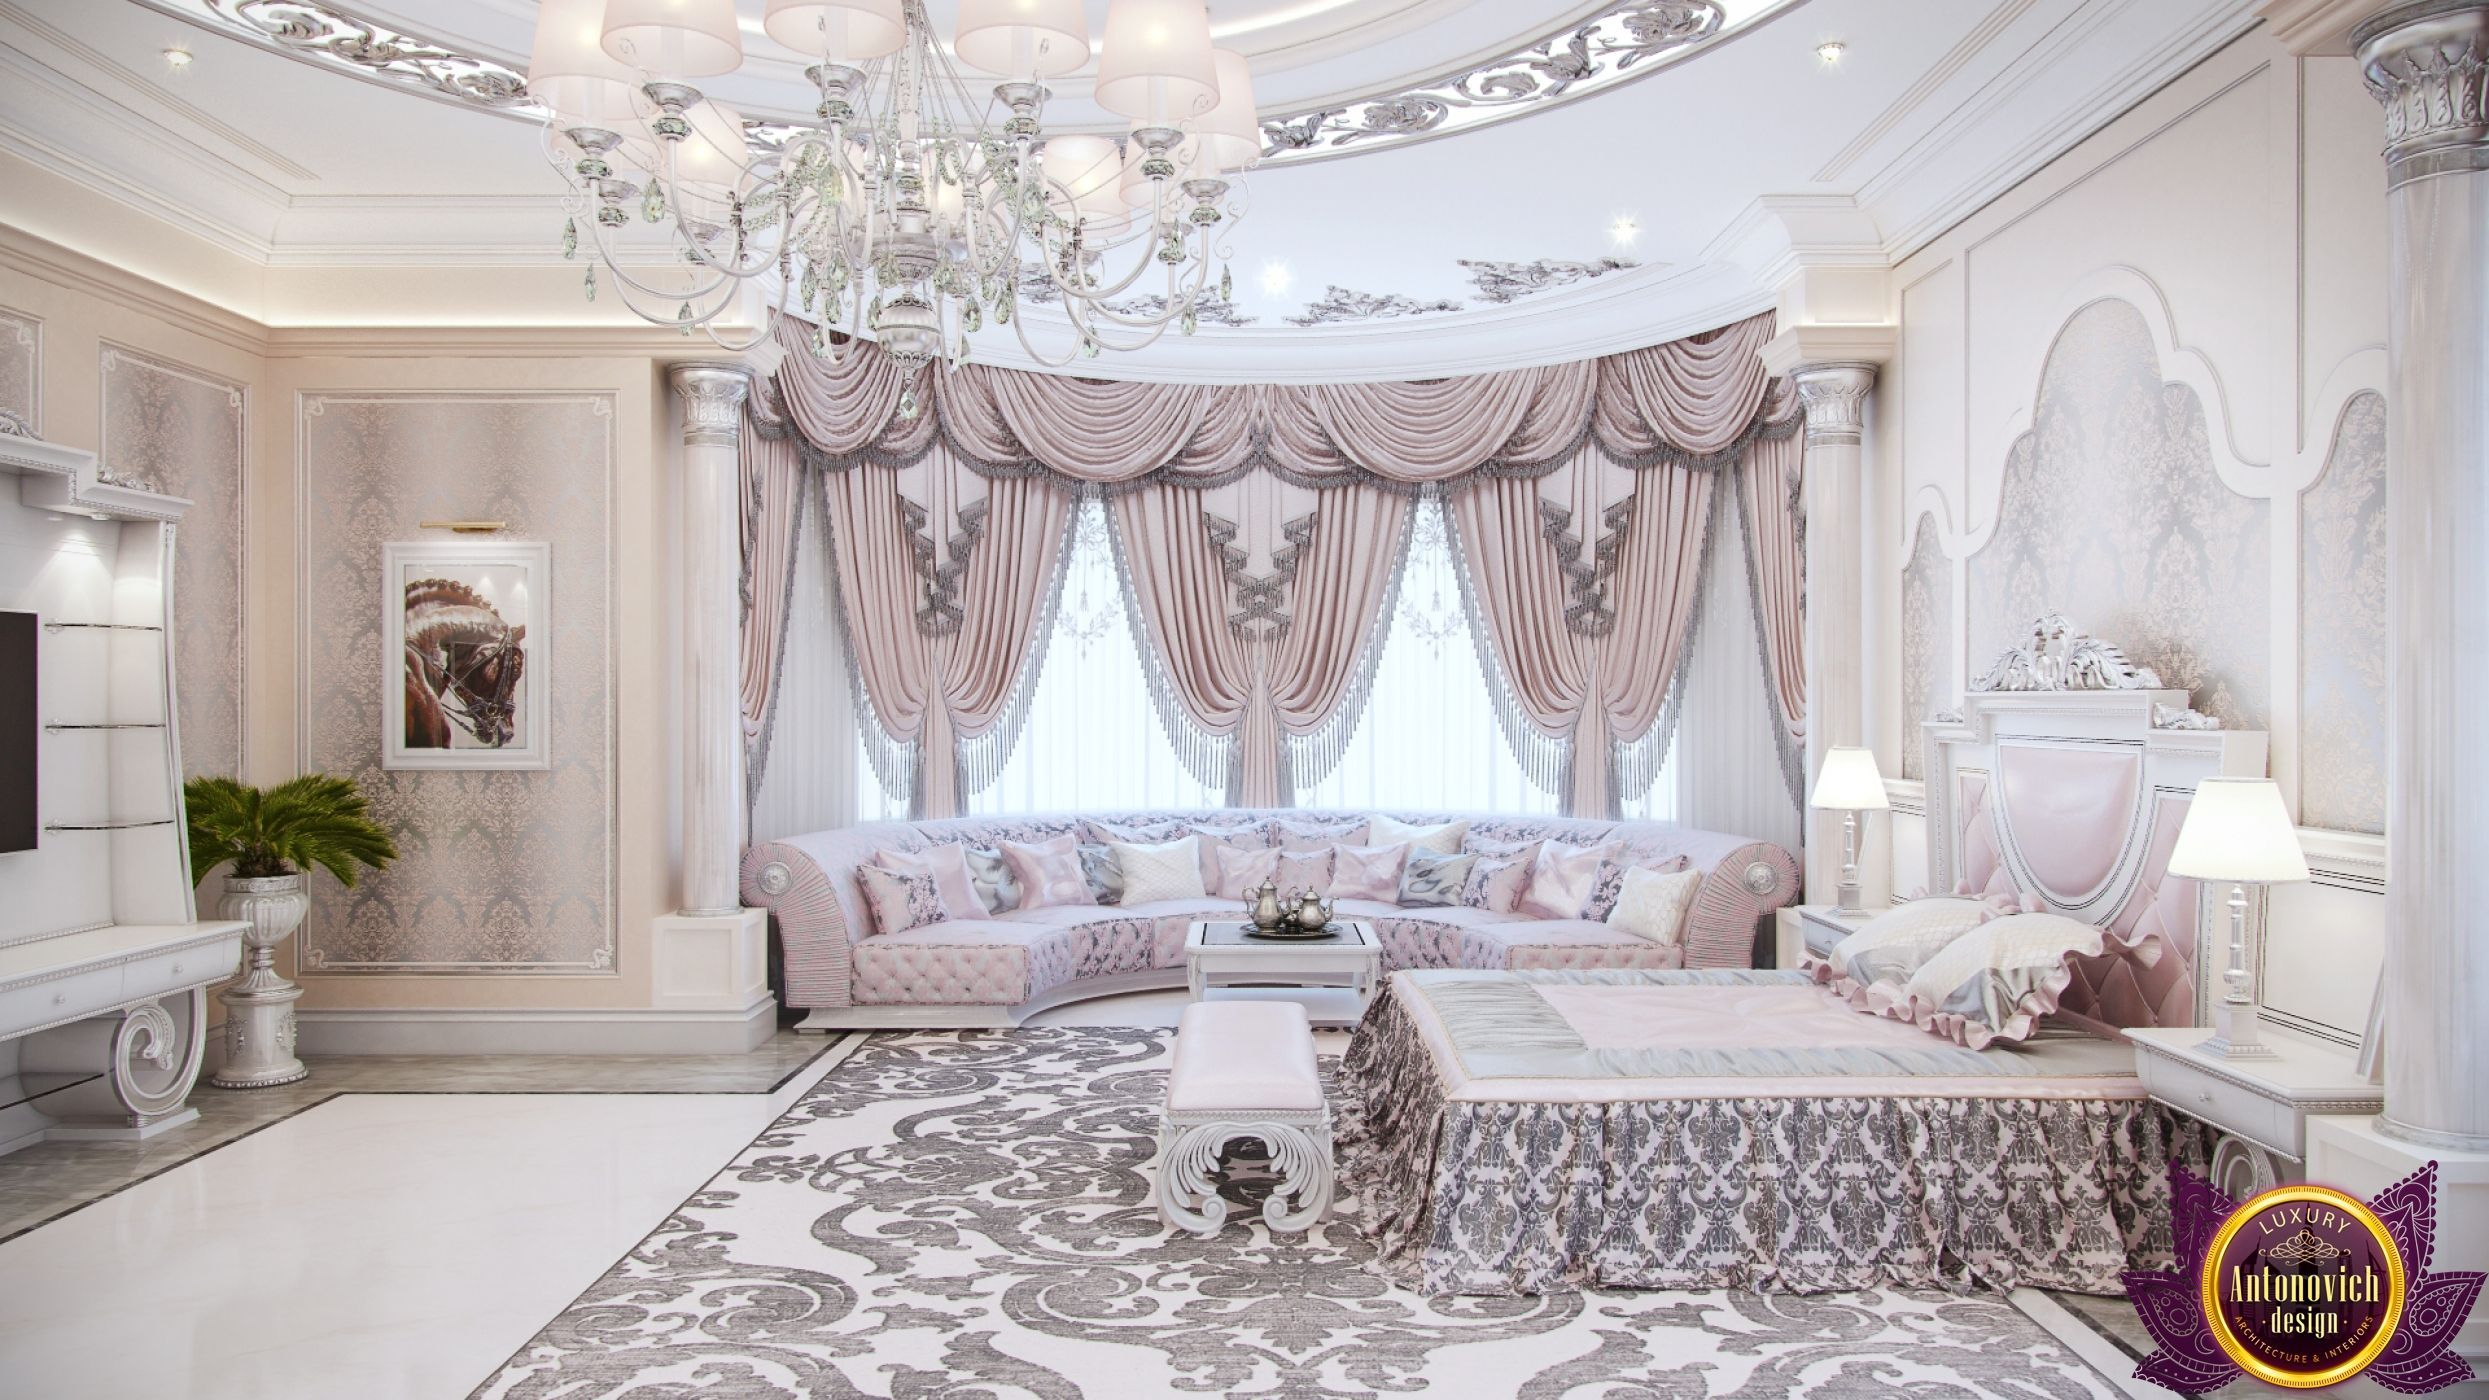 Villa Interior Design in Dubai, Luxury Villa Design in Sharjah